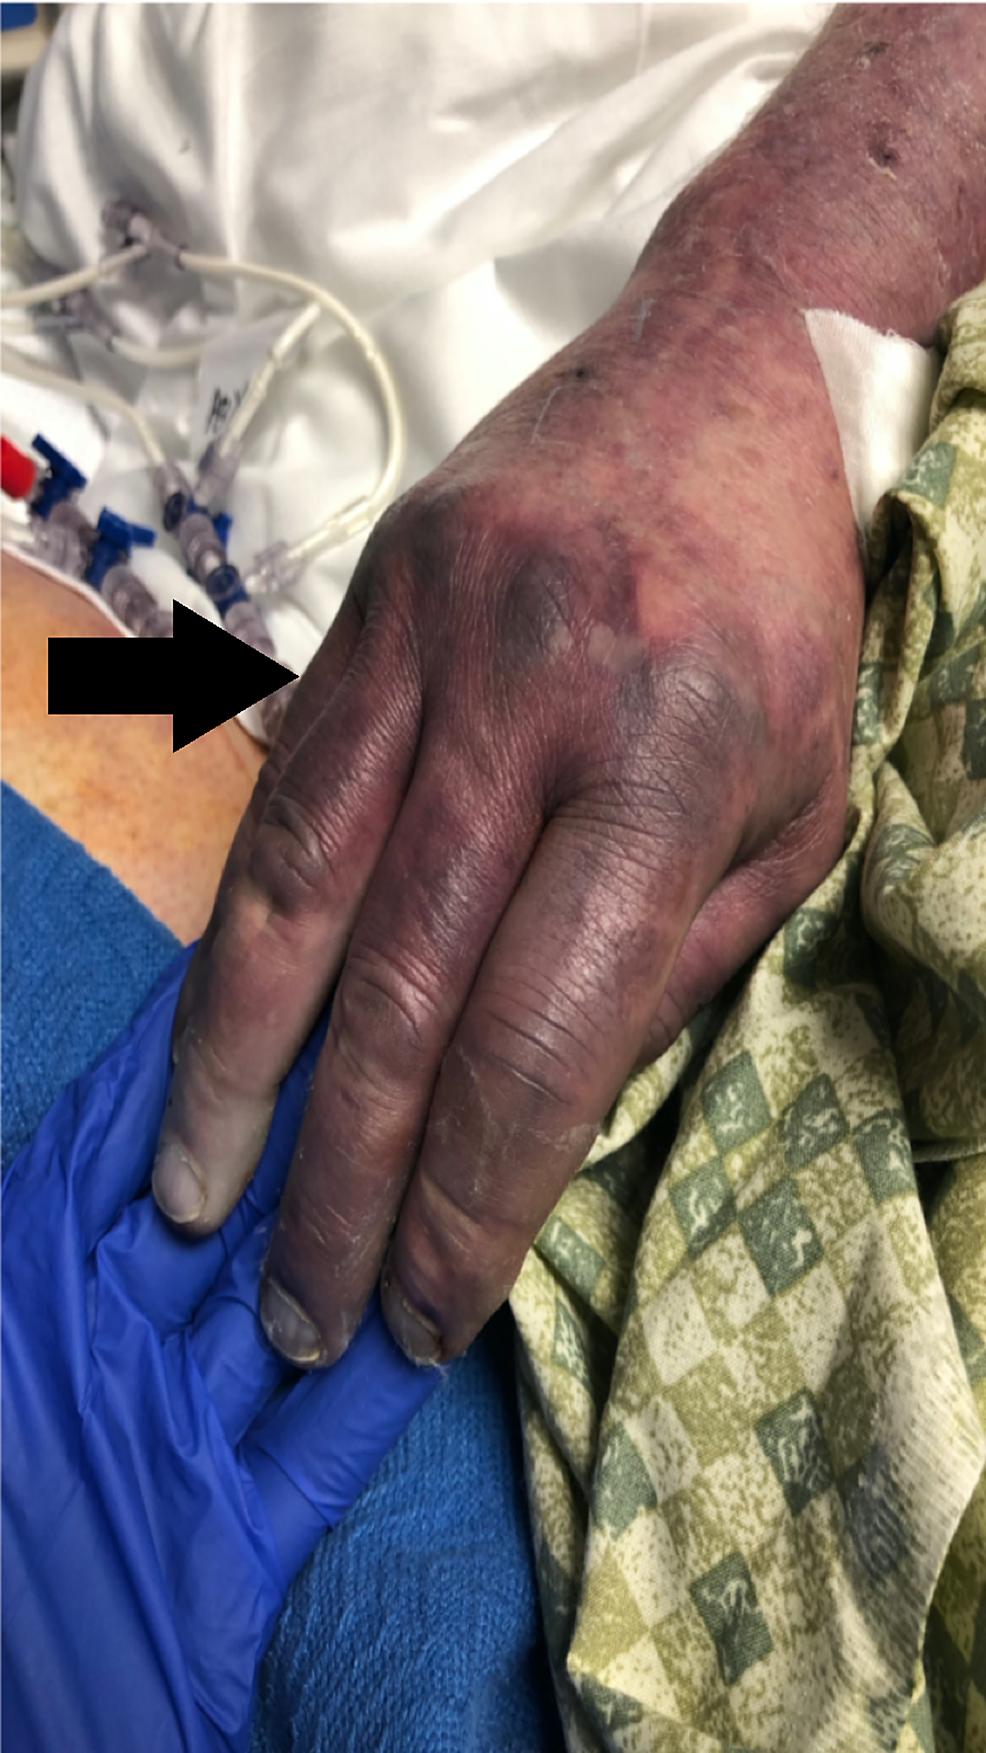 Peripheral-cyanosis---Ischemic-hand